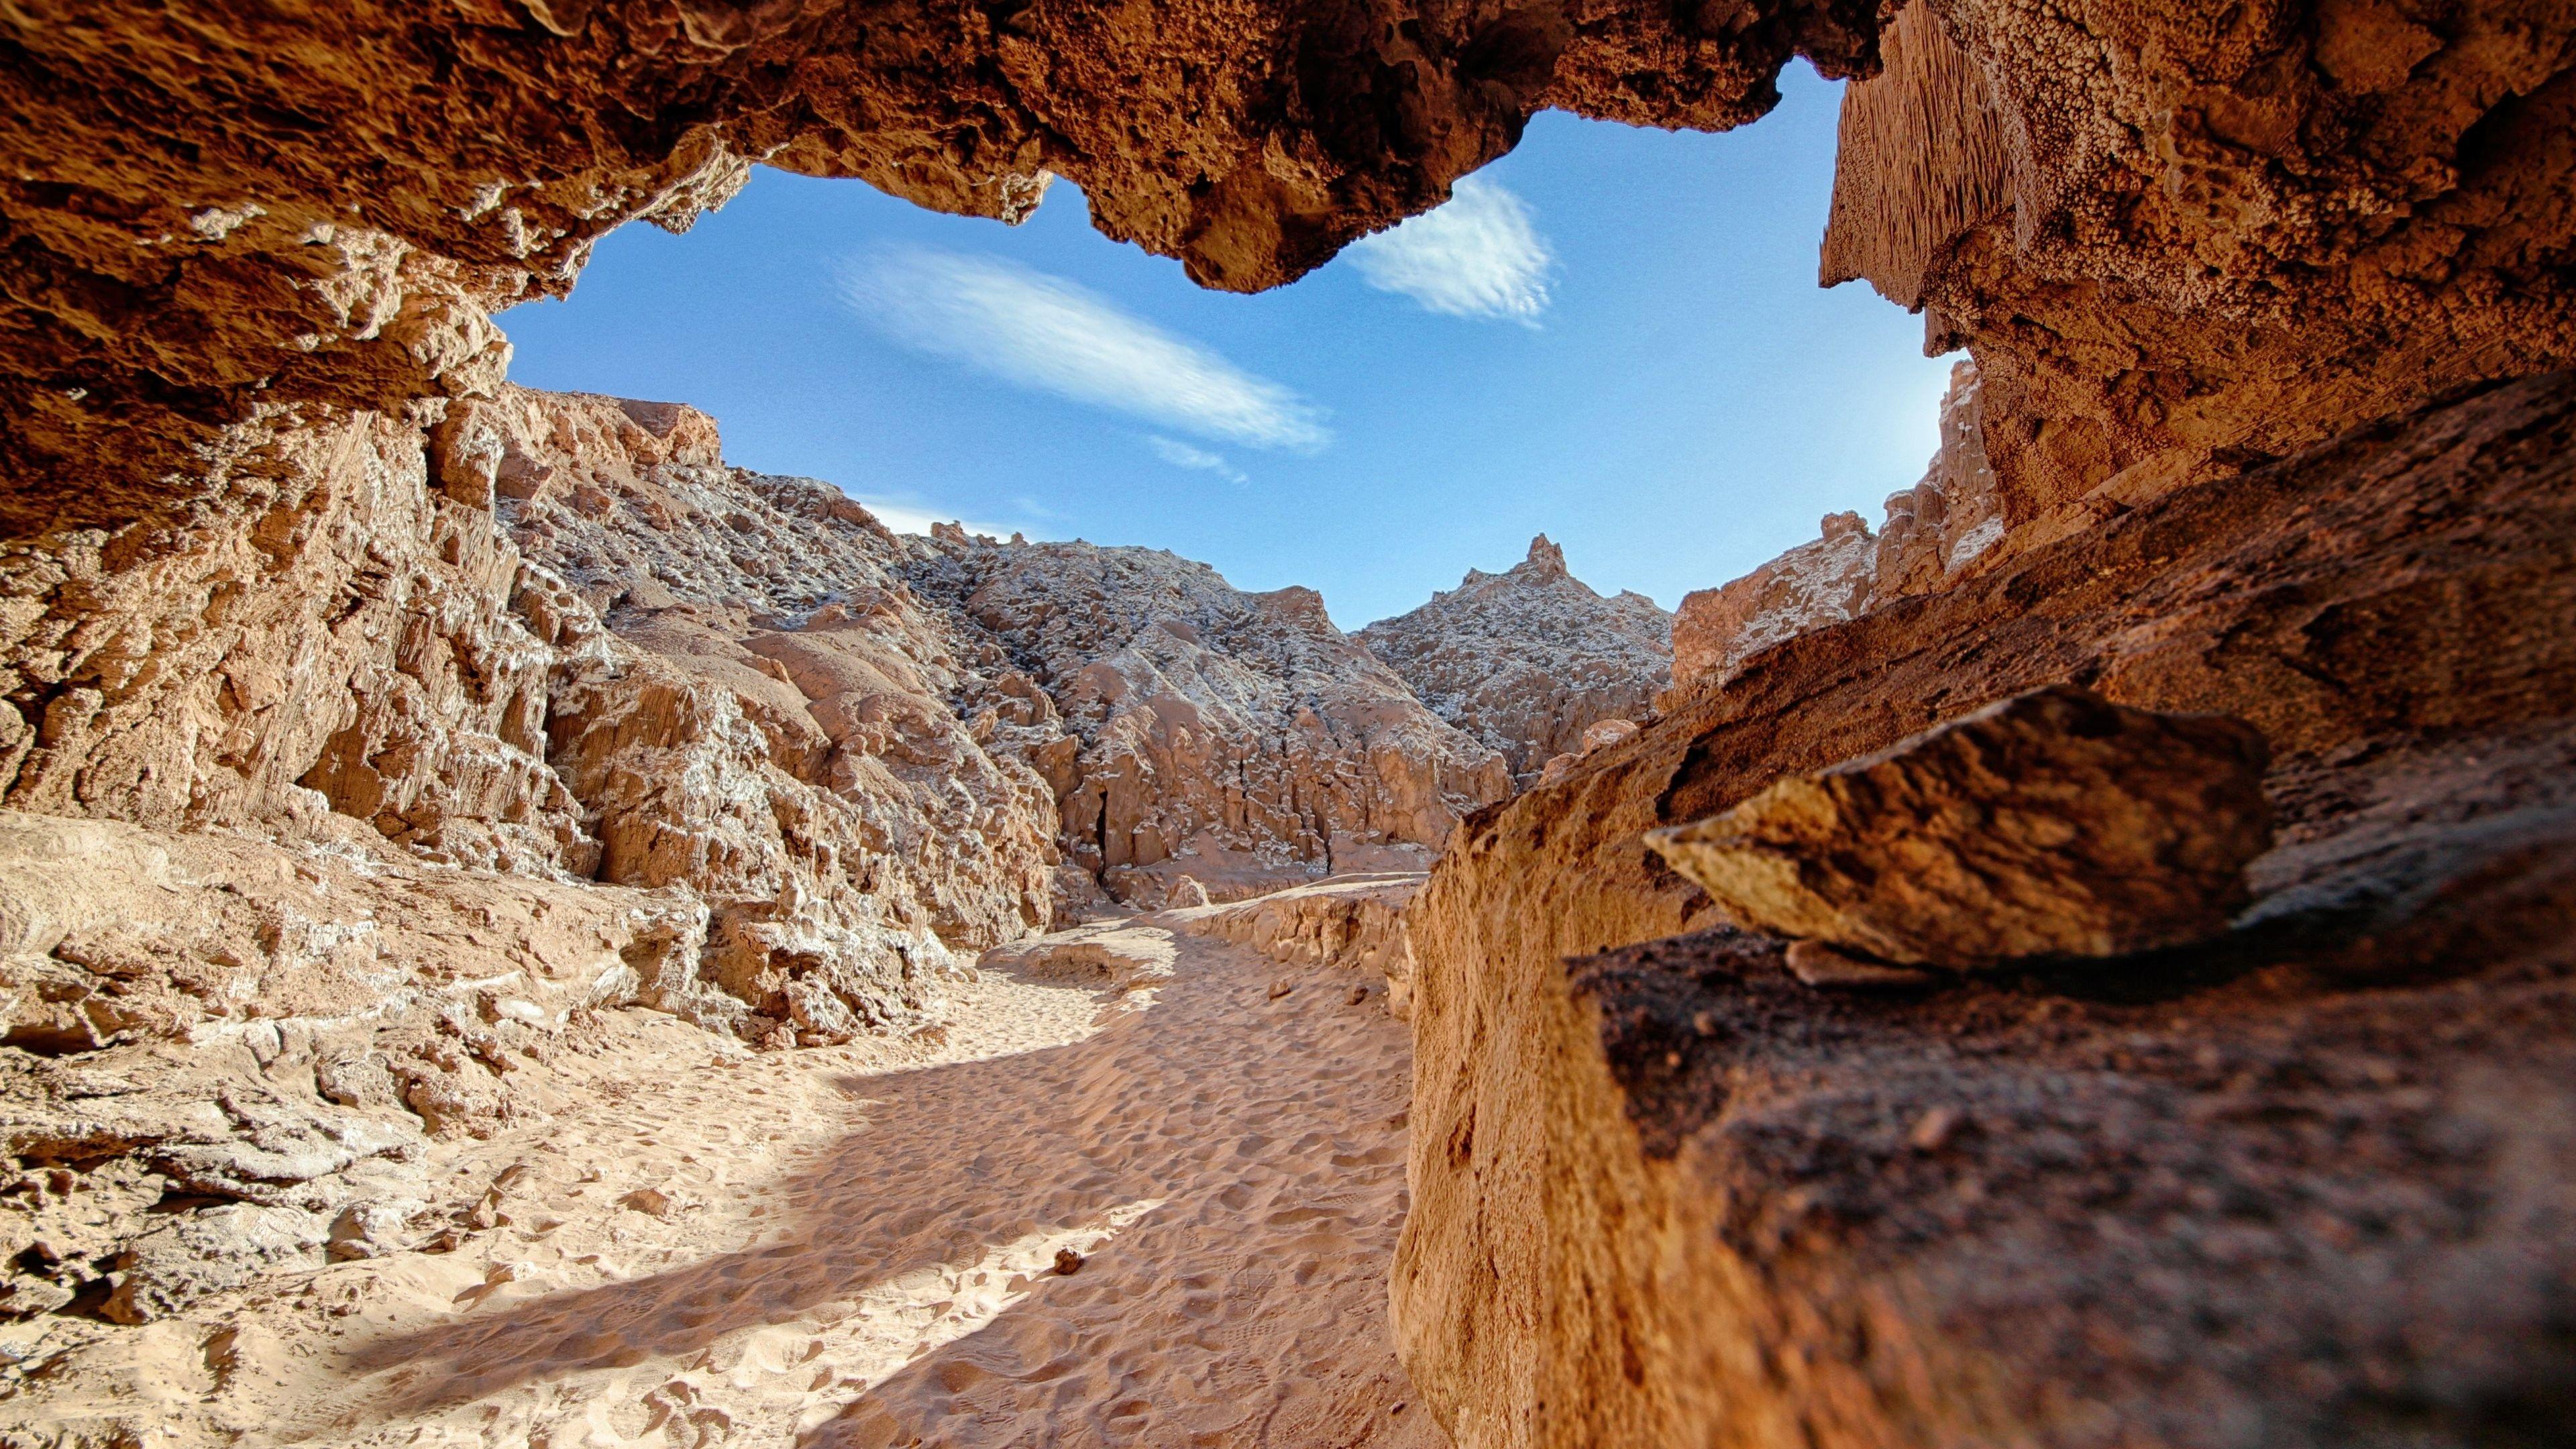 4k rock hd wallpaper 3840x2160 Rock photography Photography 3840x2160